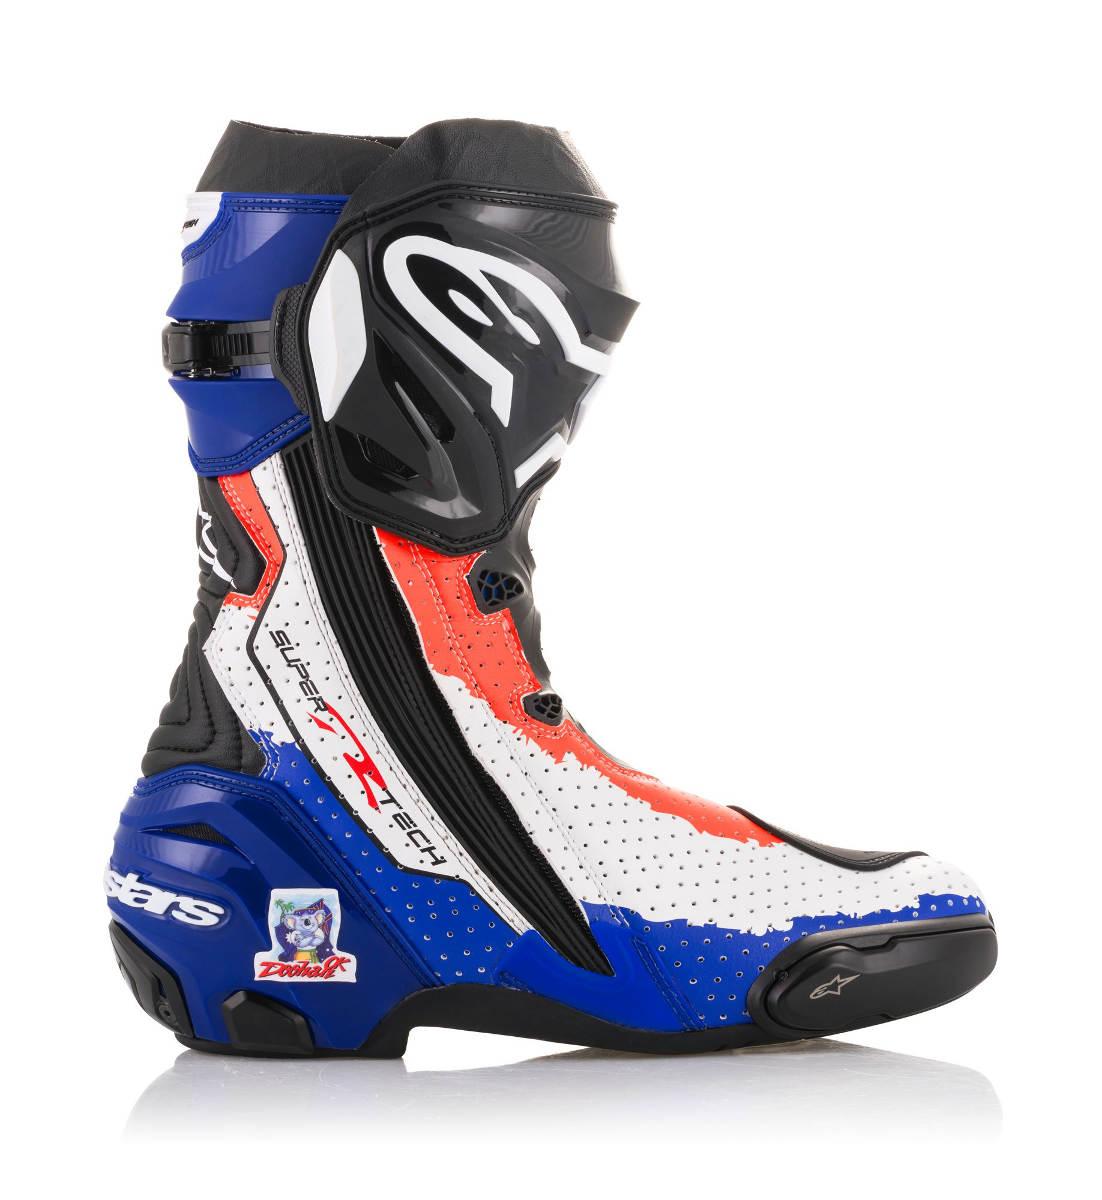 2018 Limited Edition Mick Doohan Alpinestars Supertech R Race Replica Boots Inner Side